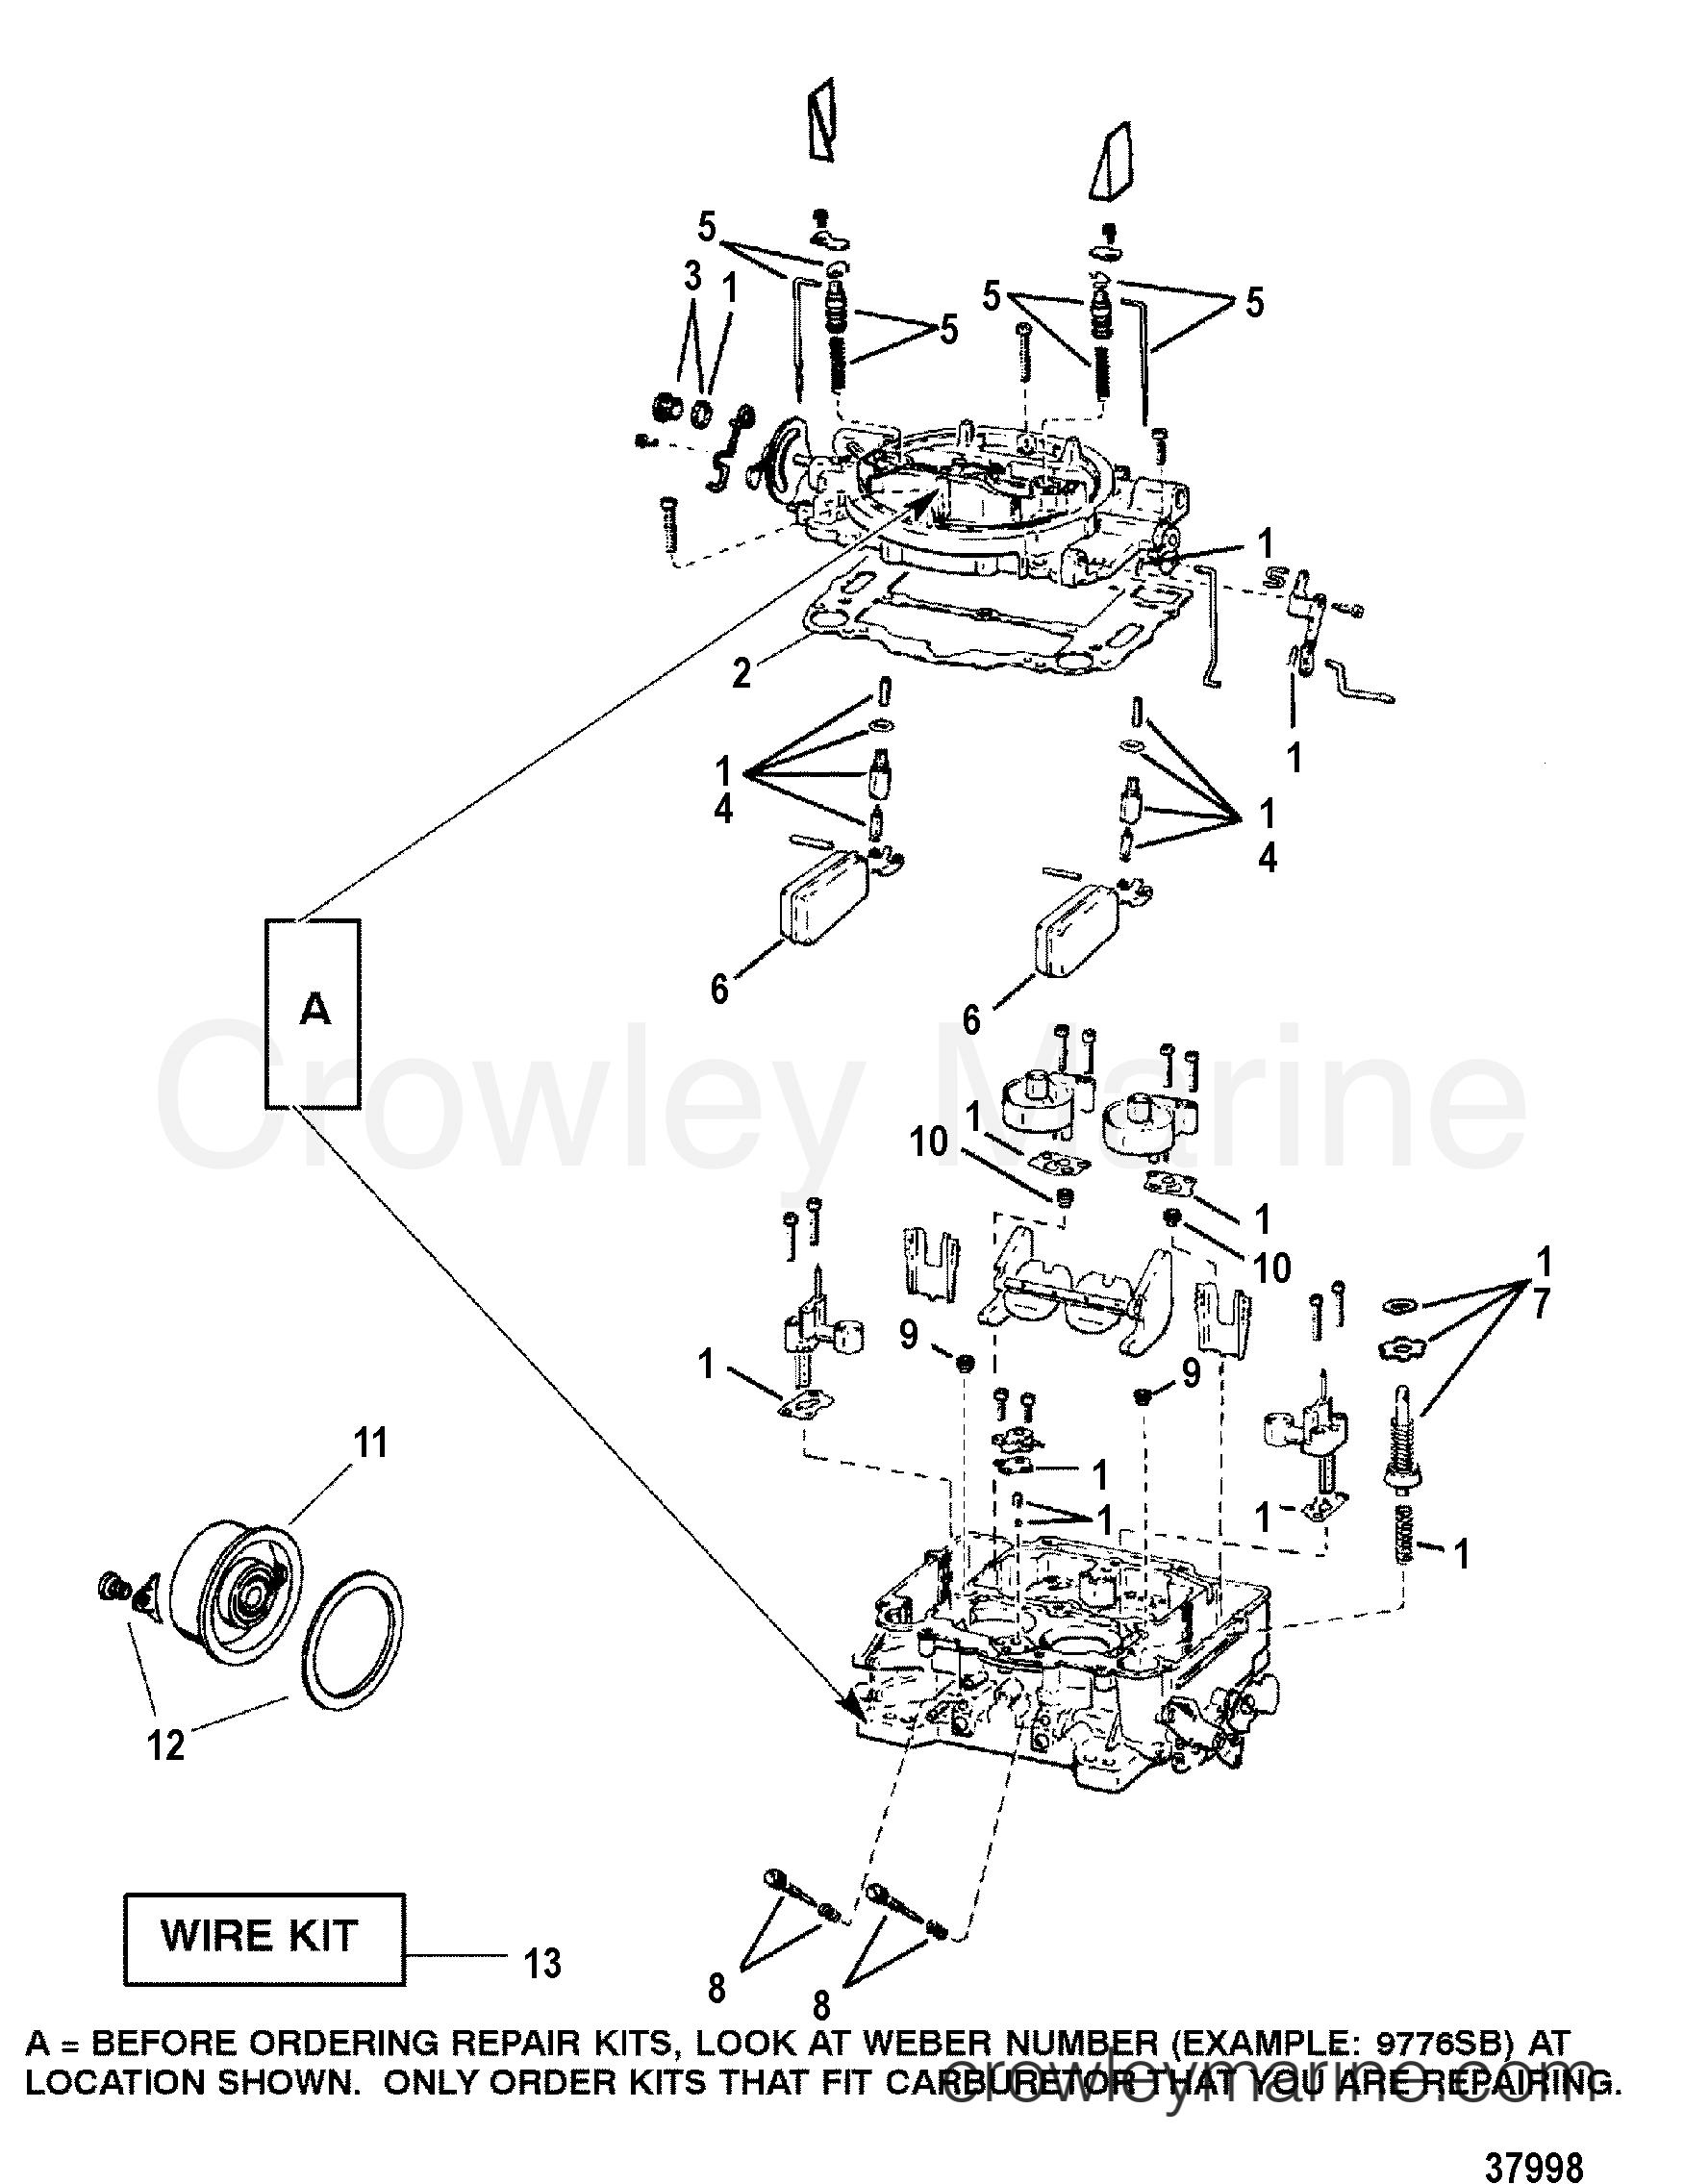 carburetor(weber) 1996 mercruiser 4 3lx [alpha] 443lc00jt 4.3 l mercruiser engine 1996 mercruiser 4 3lx [alpha] 443lc00jt carburetor(weber) section